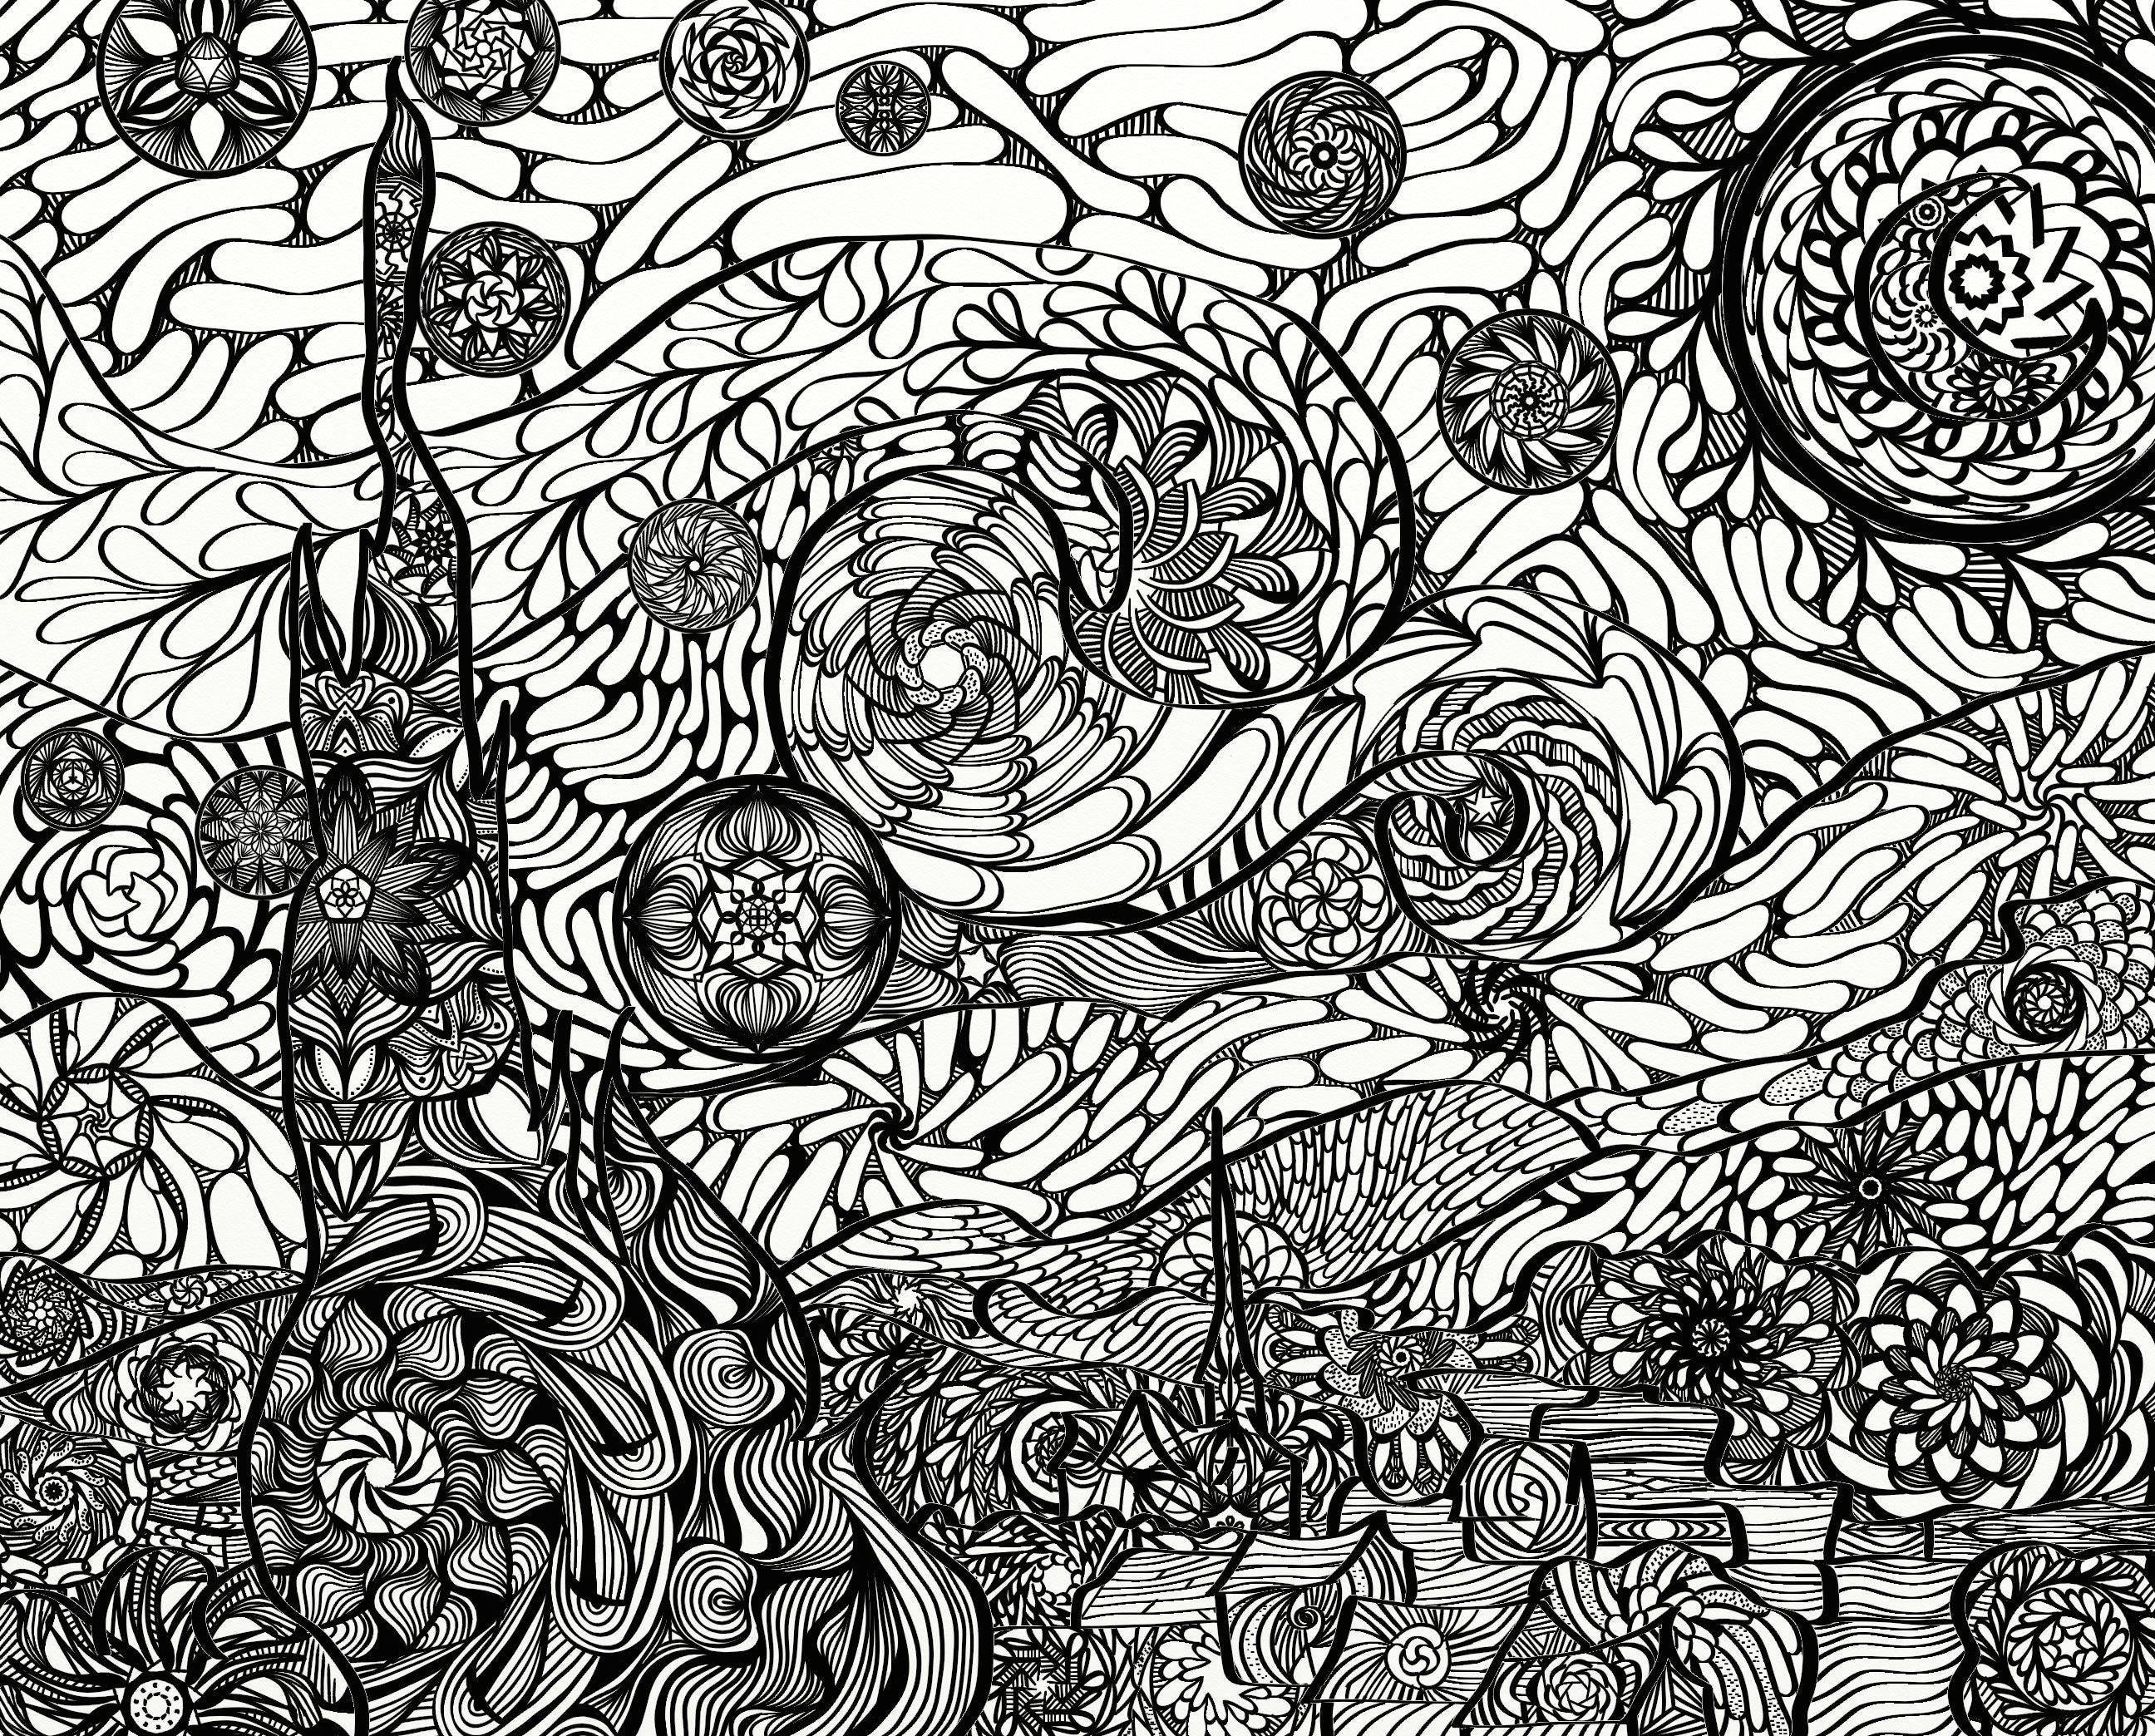 Starry Night van Gogh Mandala Adult